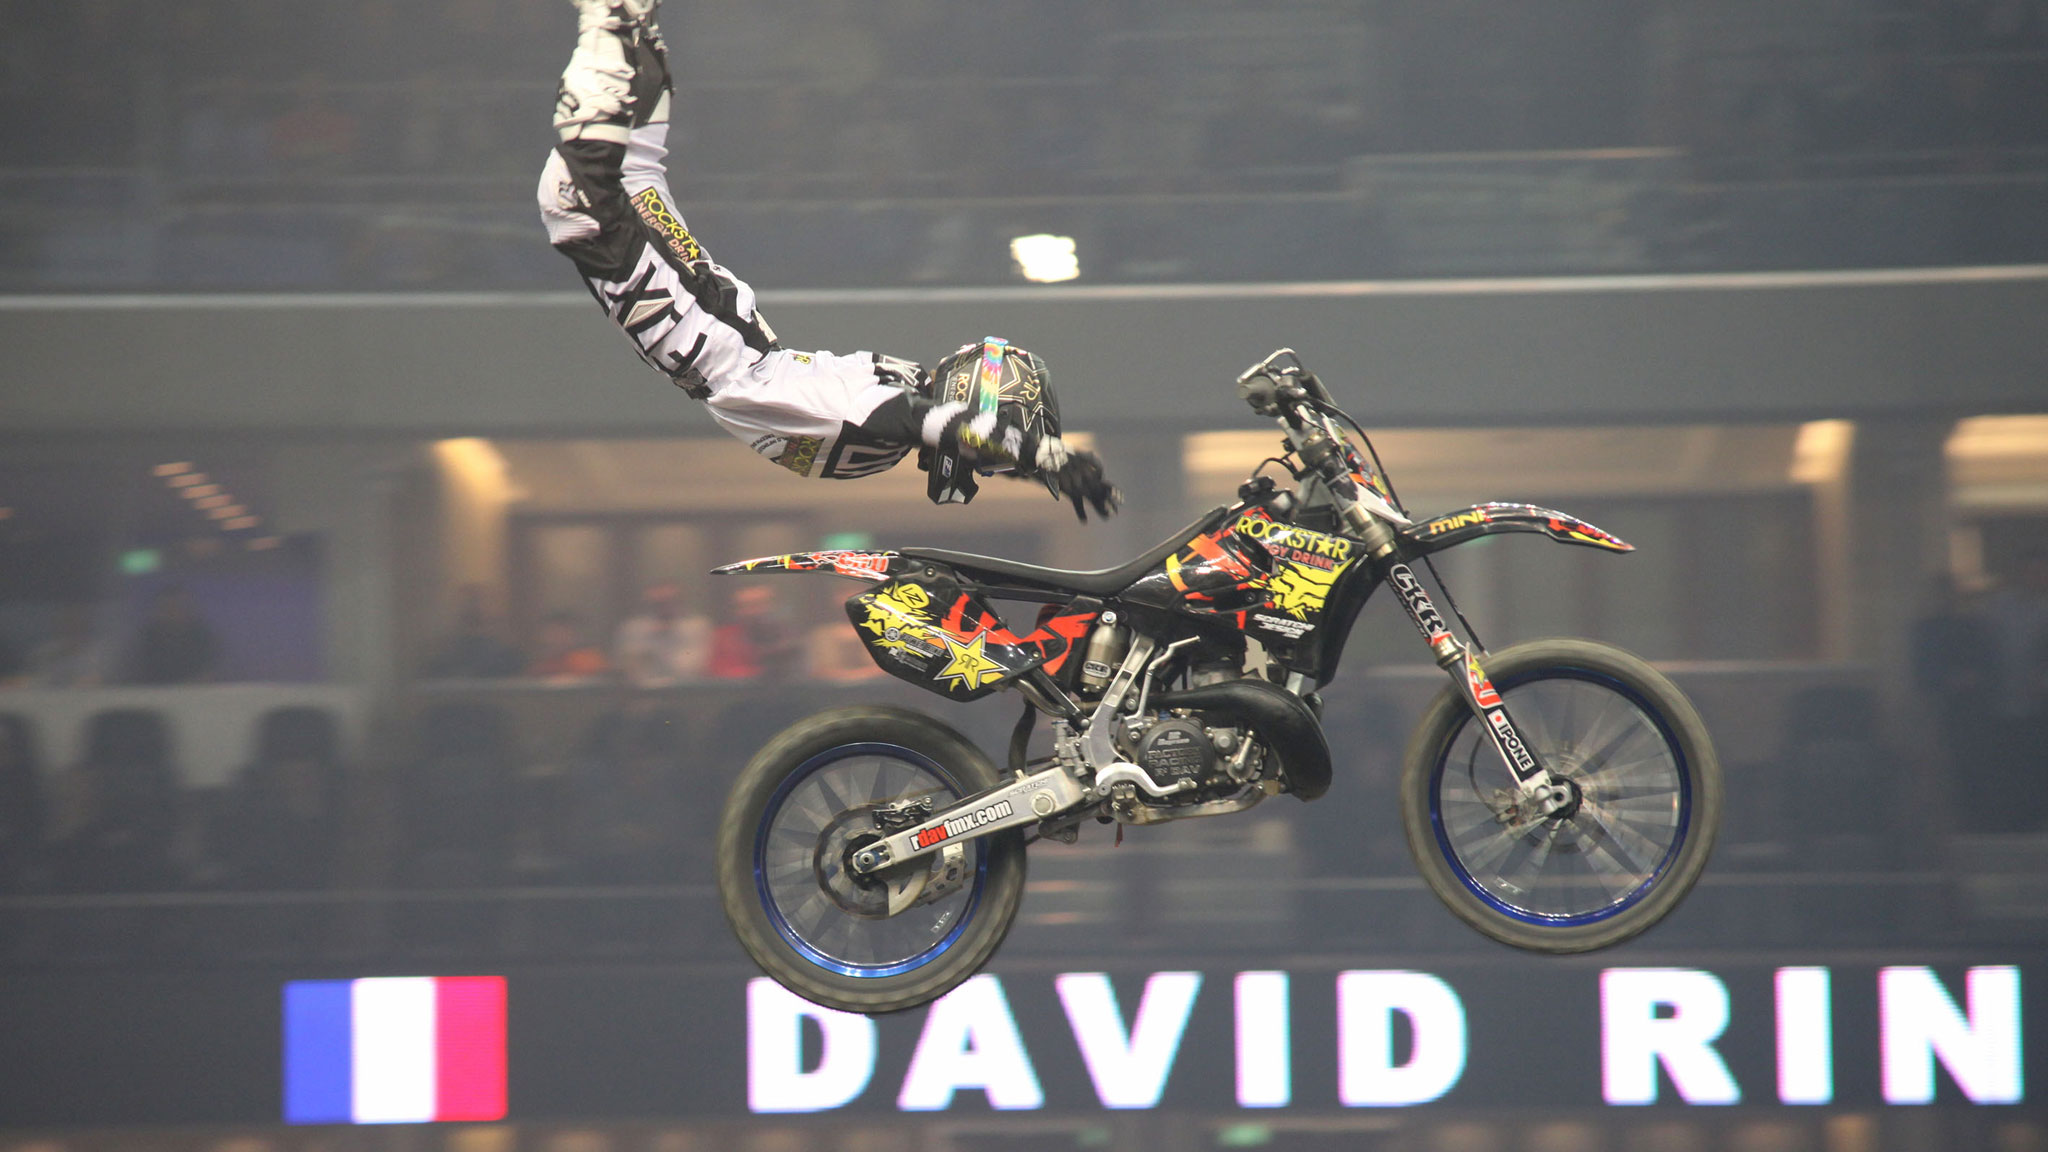 David Rinaldo